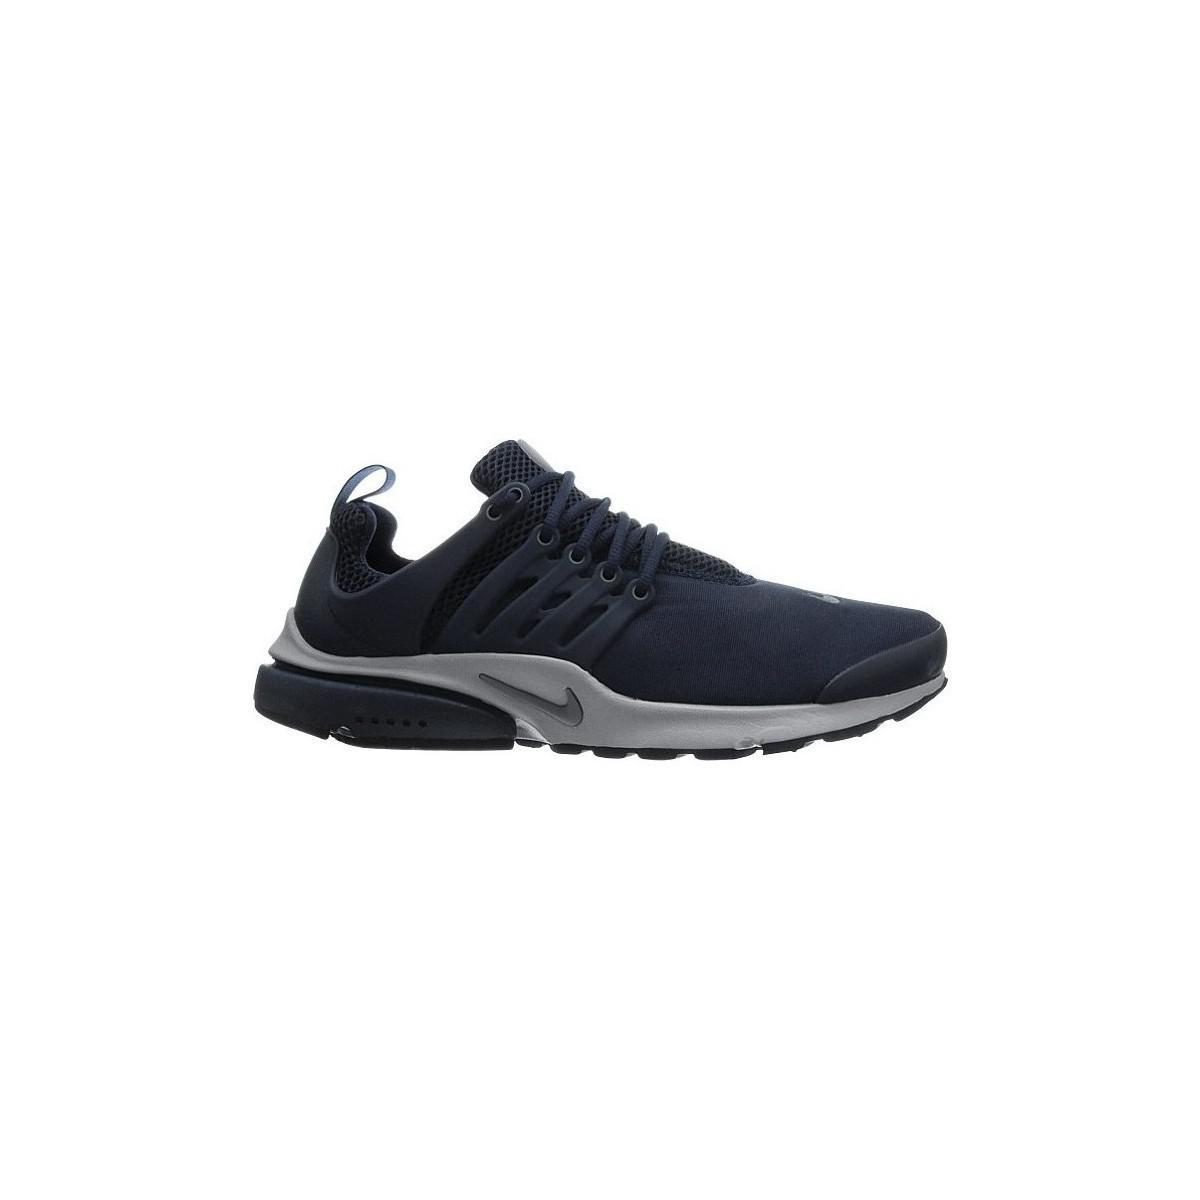 Nike Air Presto Zapatos De Hombre Esencial Formadores Para En Gris En Gris Para Formadores e85eb8